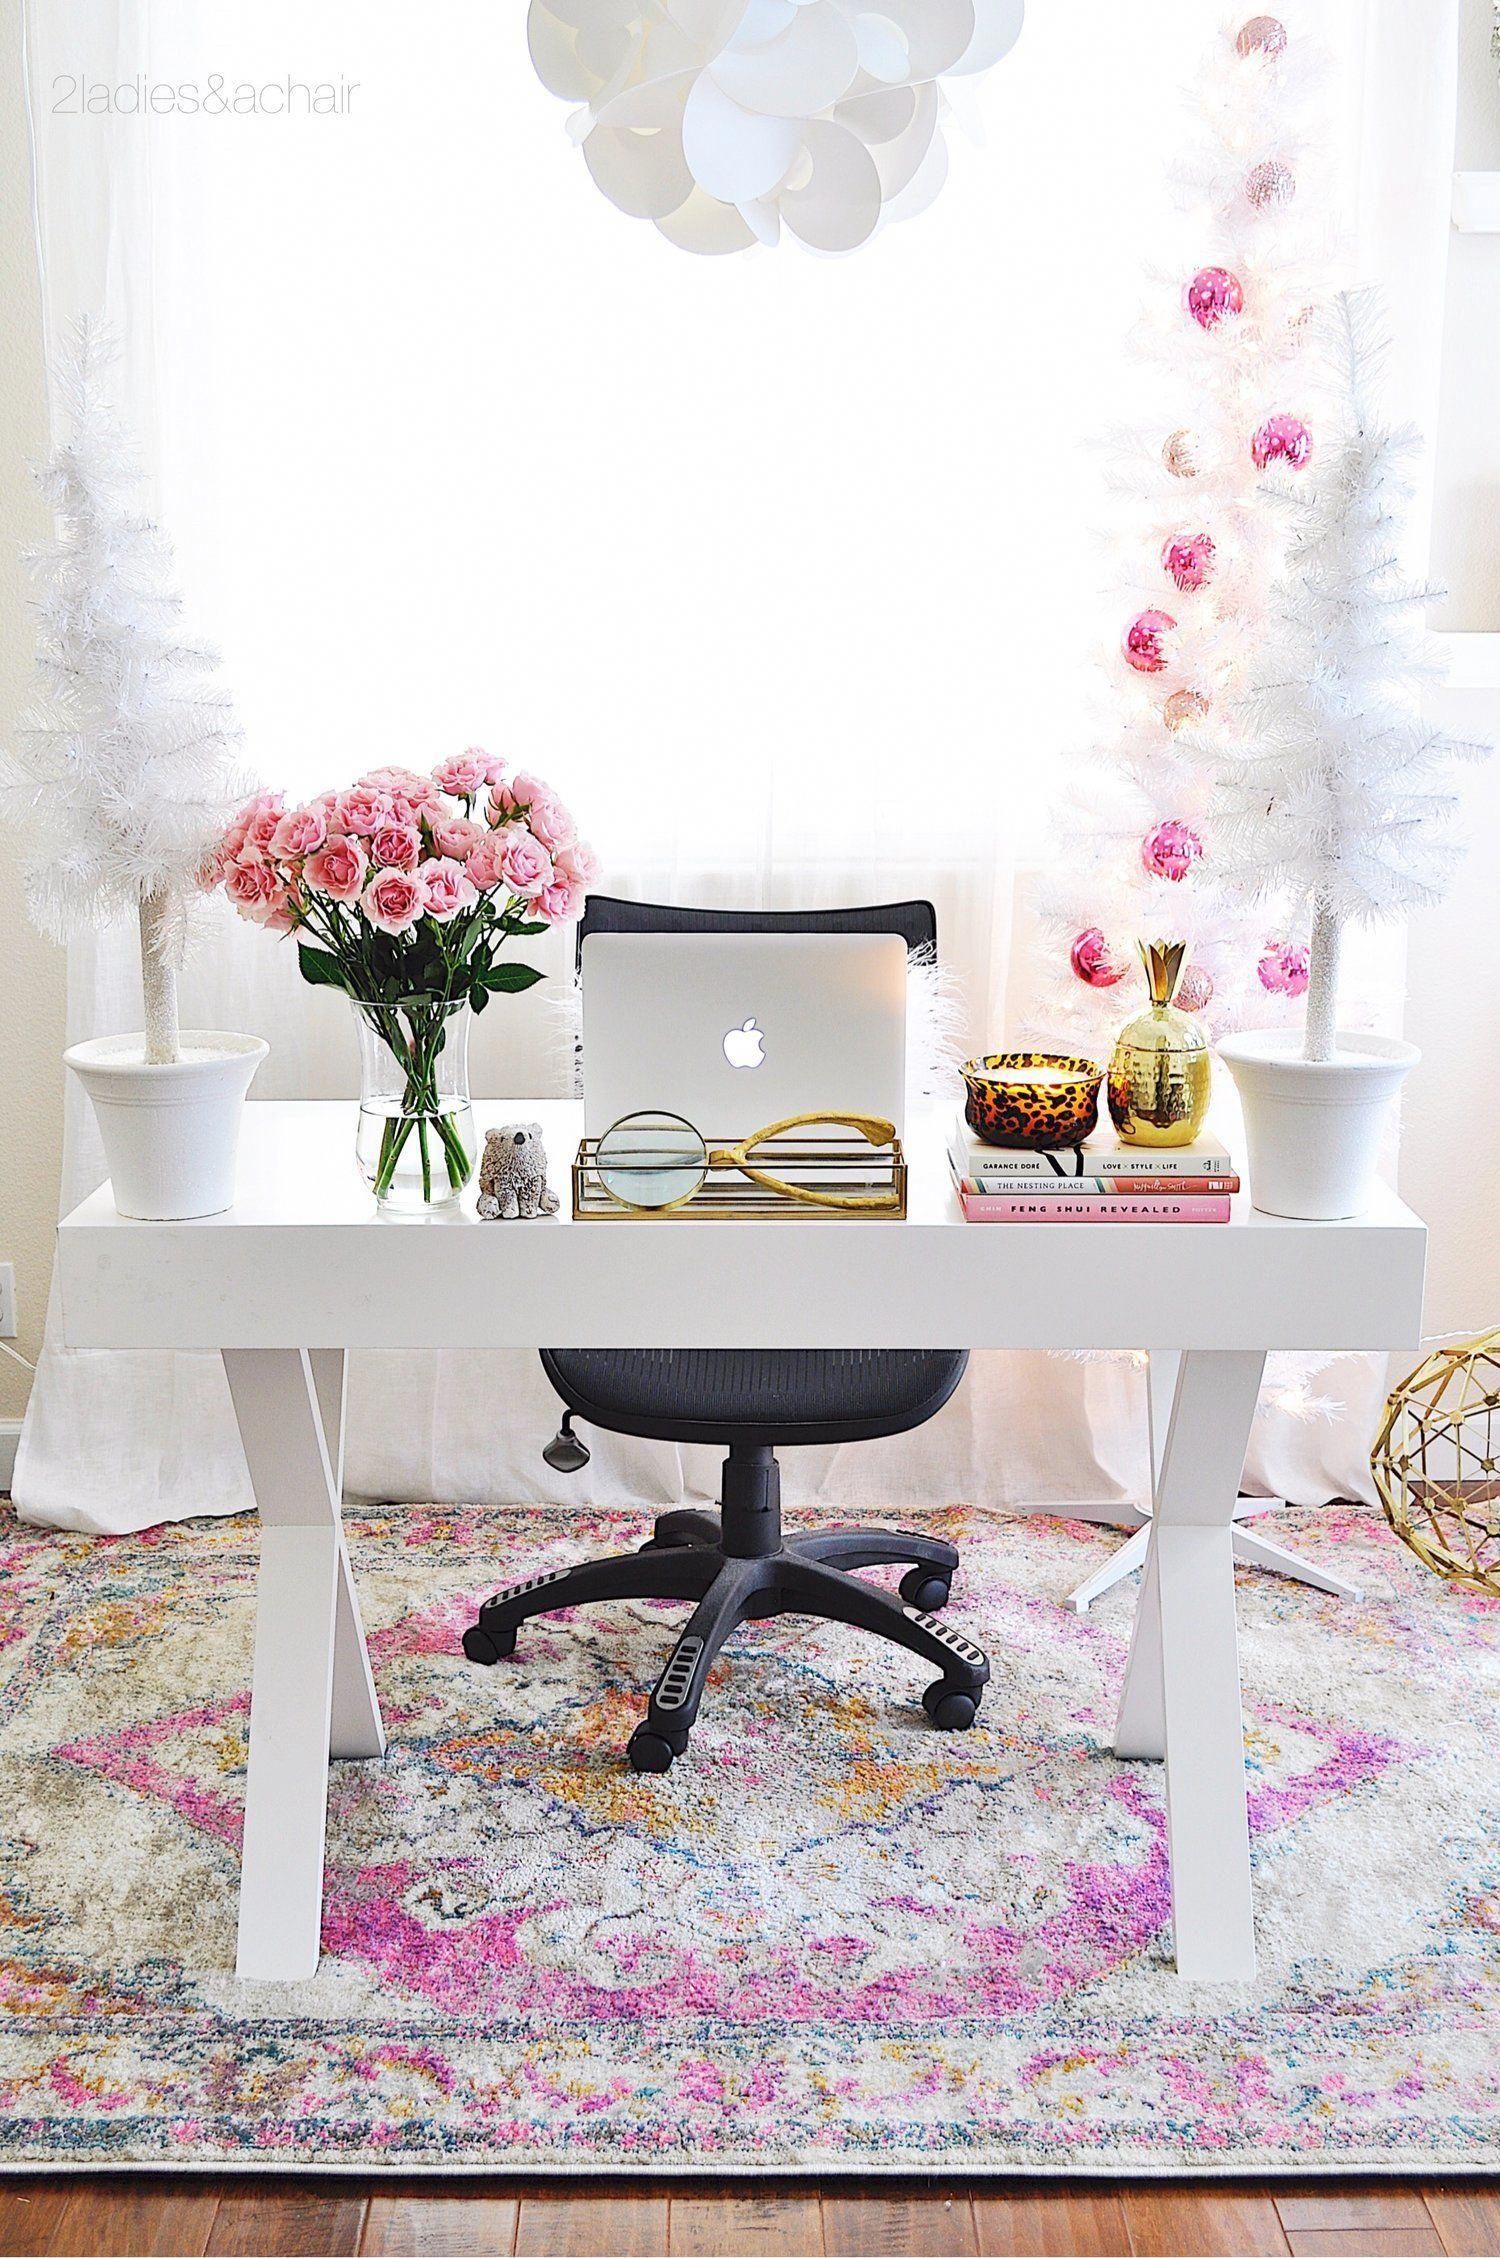 Home Office Room Design Modern Decor Ideas Black